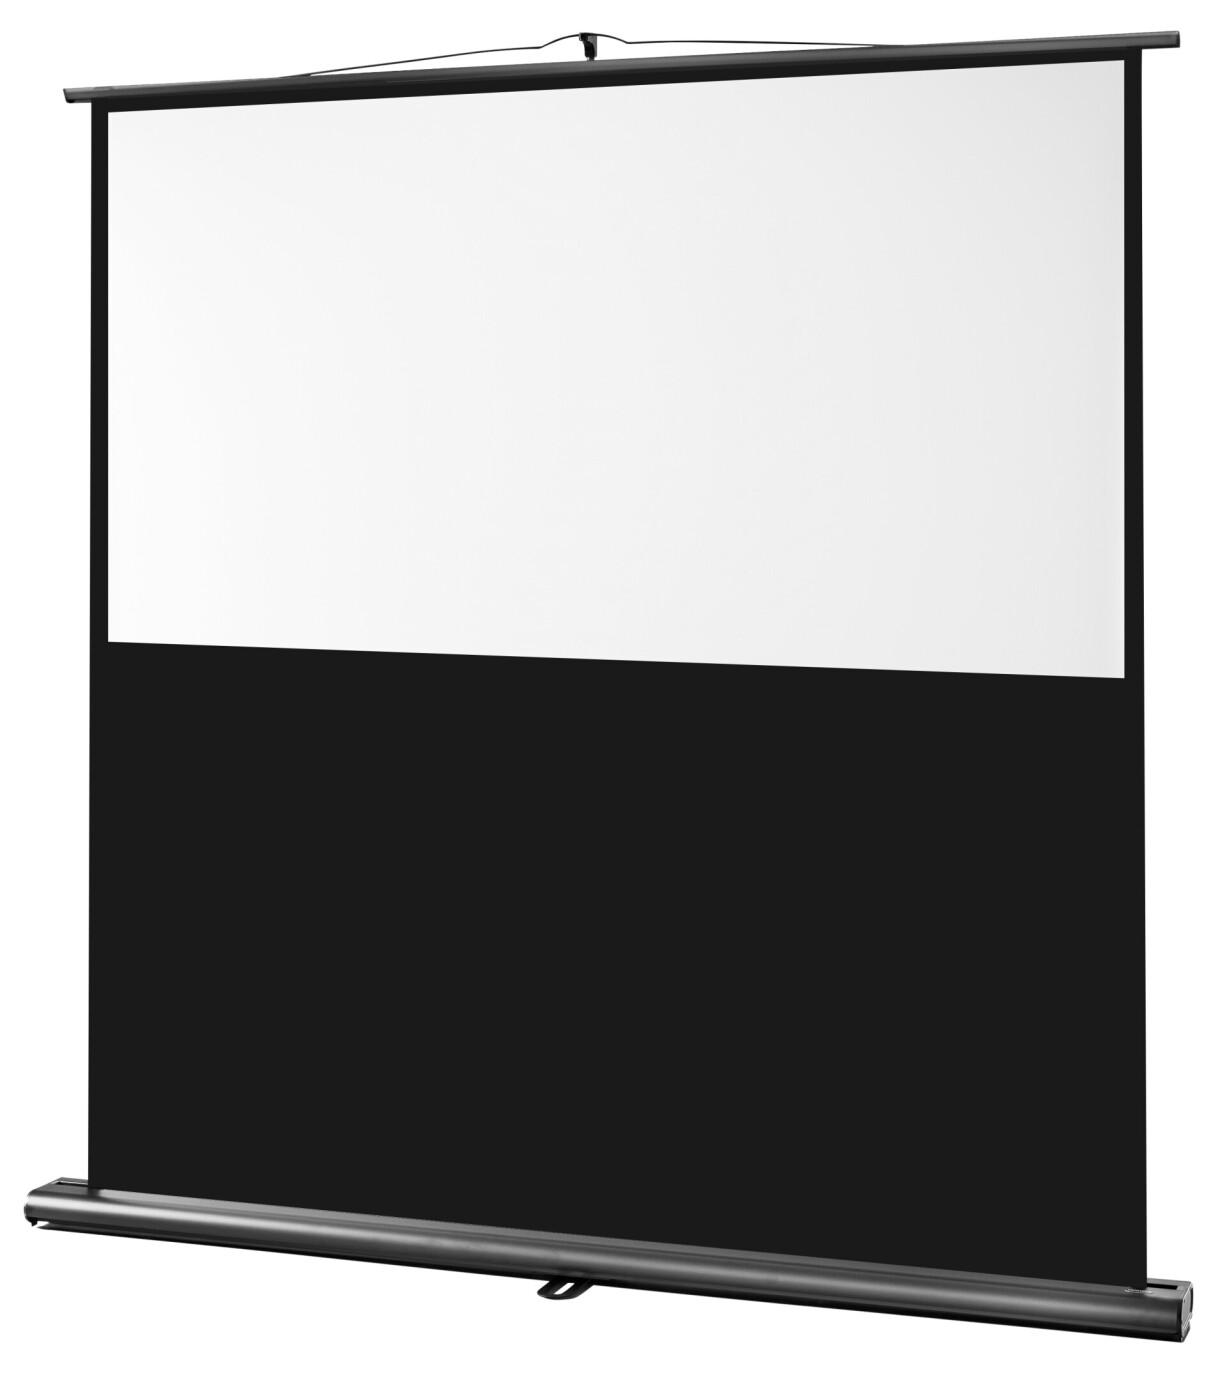 celexon Leinwand Ultramobil Professional 120 x 75 cm